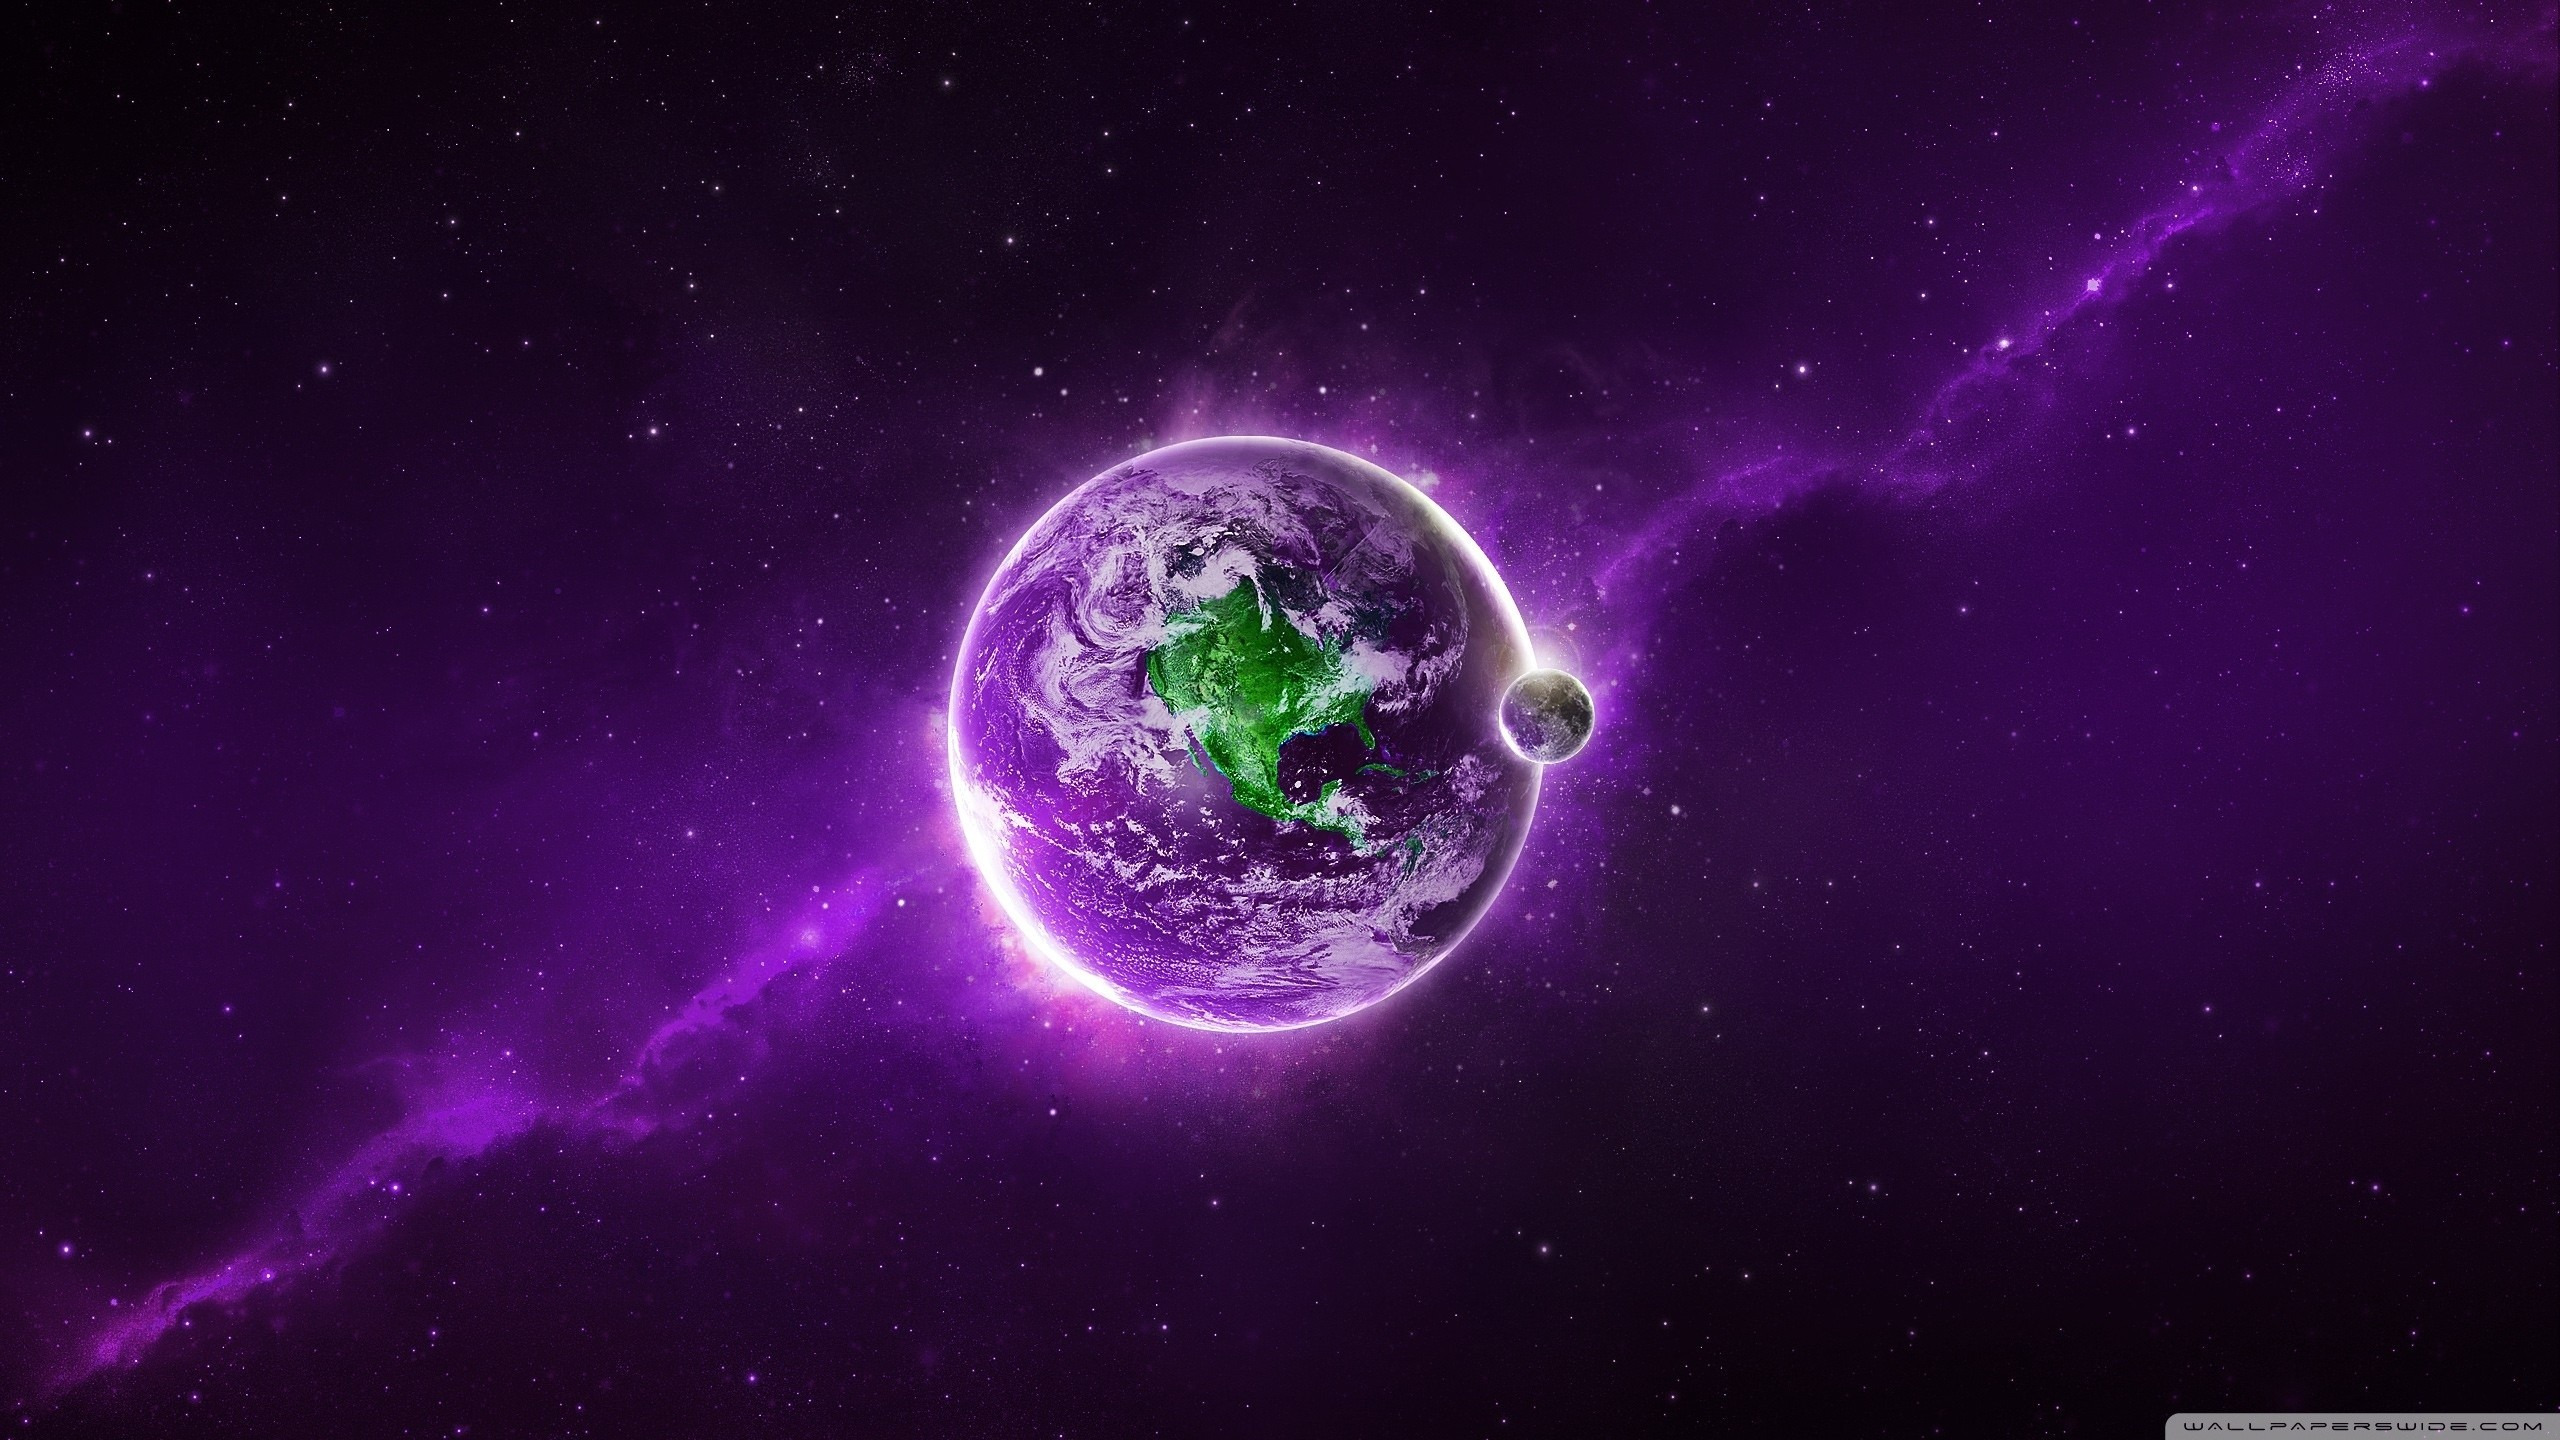 … abstract purple earth hd desktop wallpaper high definition …